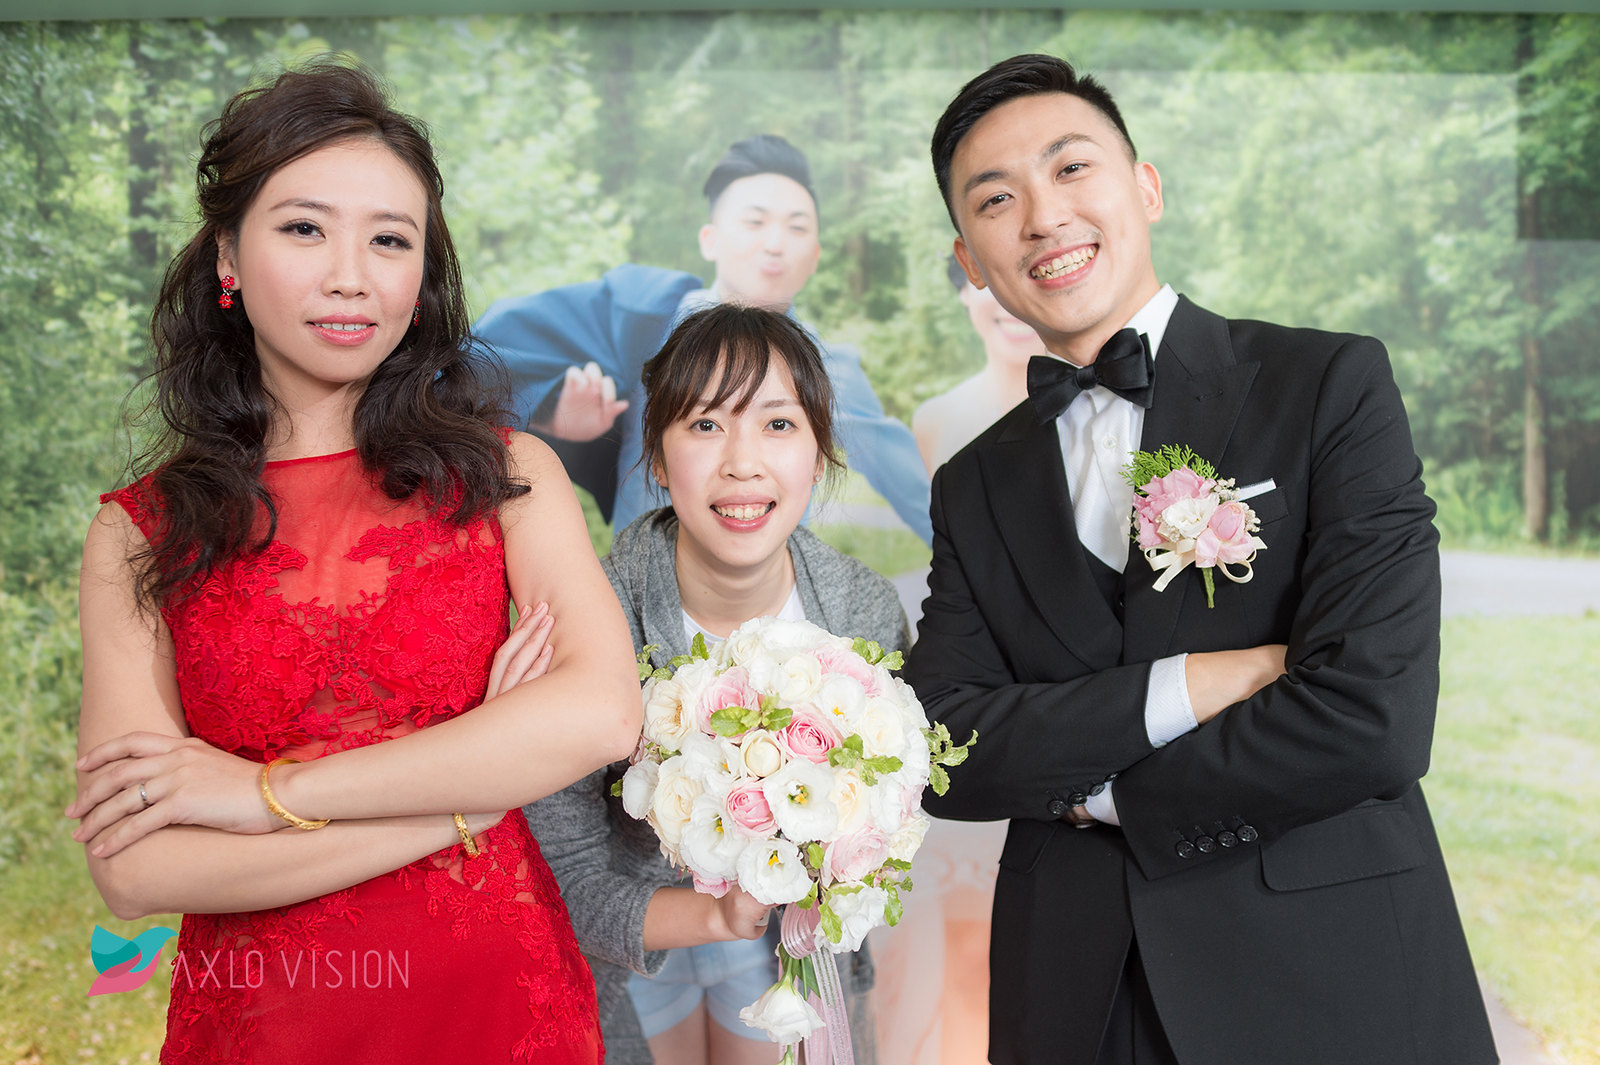 20170916 WeddingDay_196